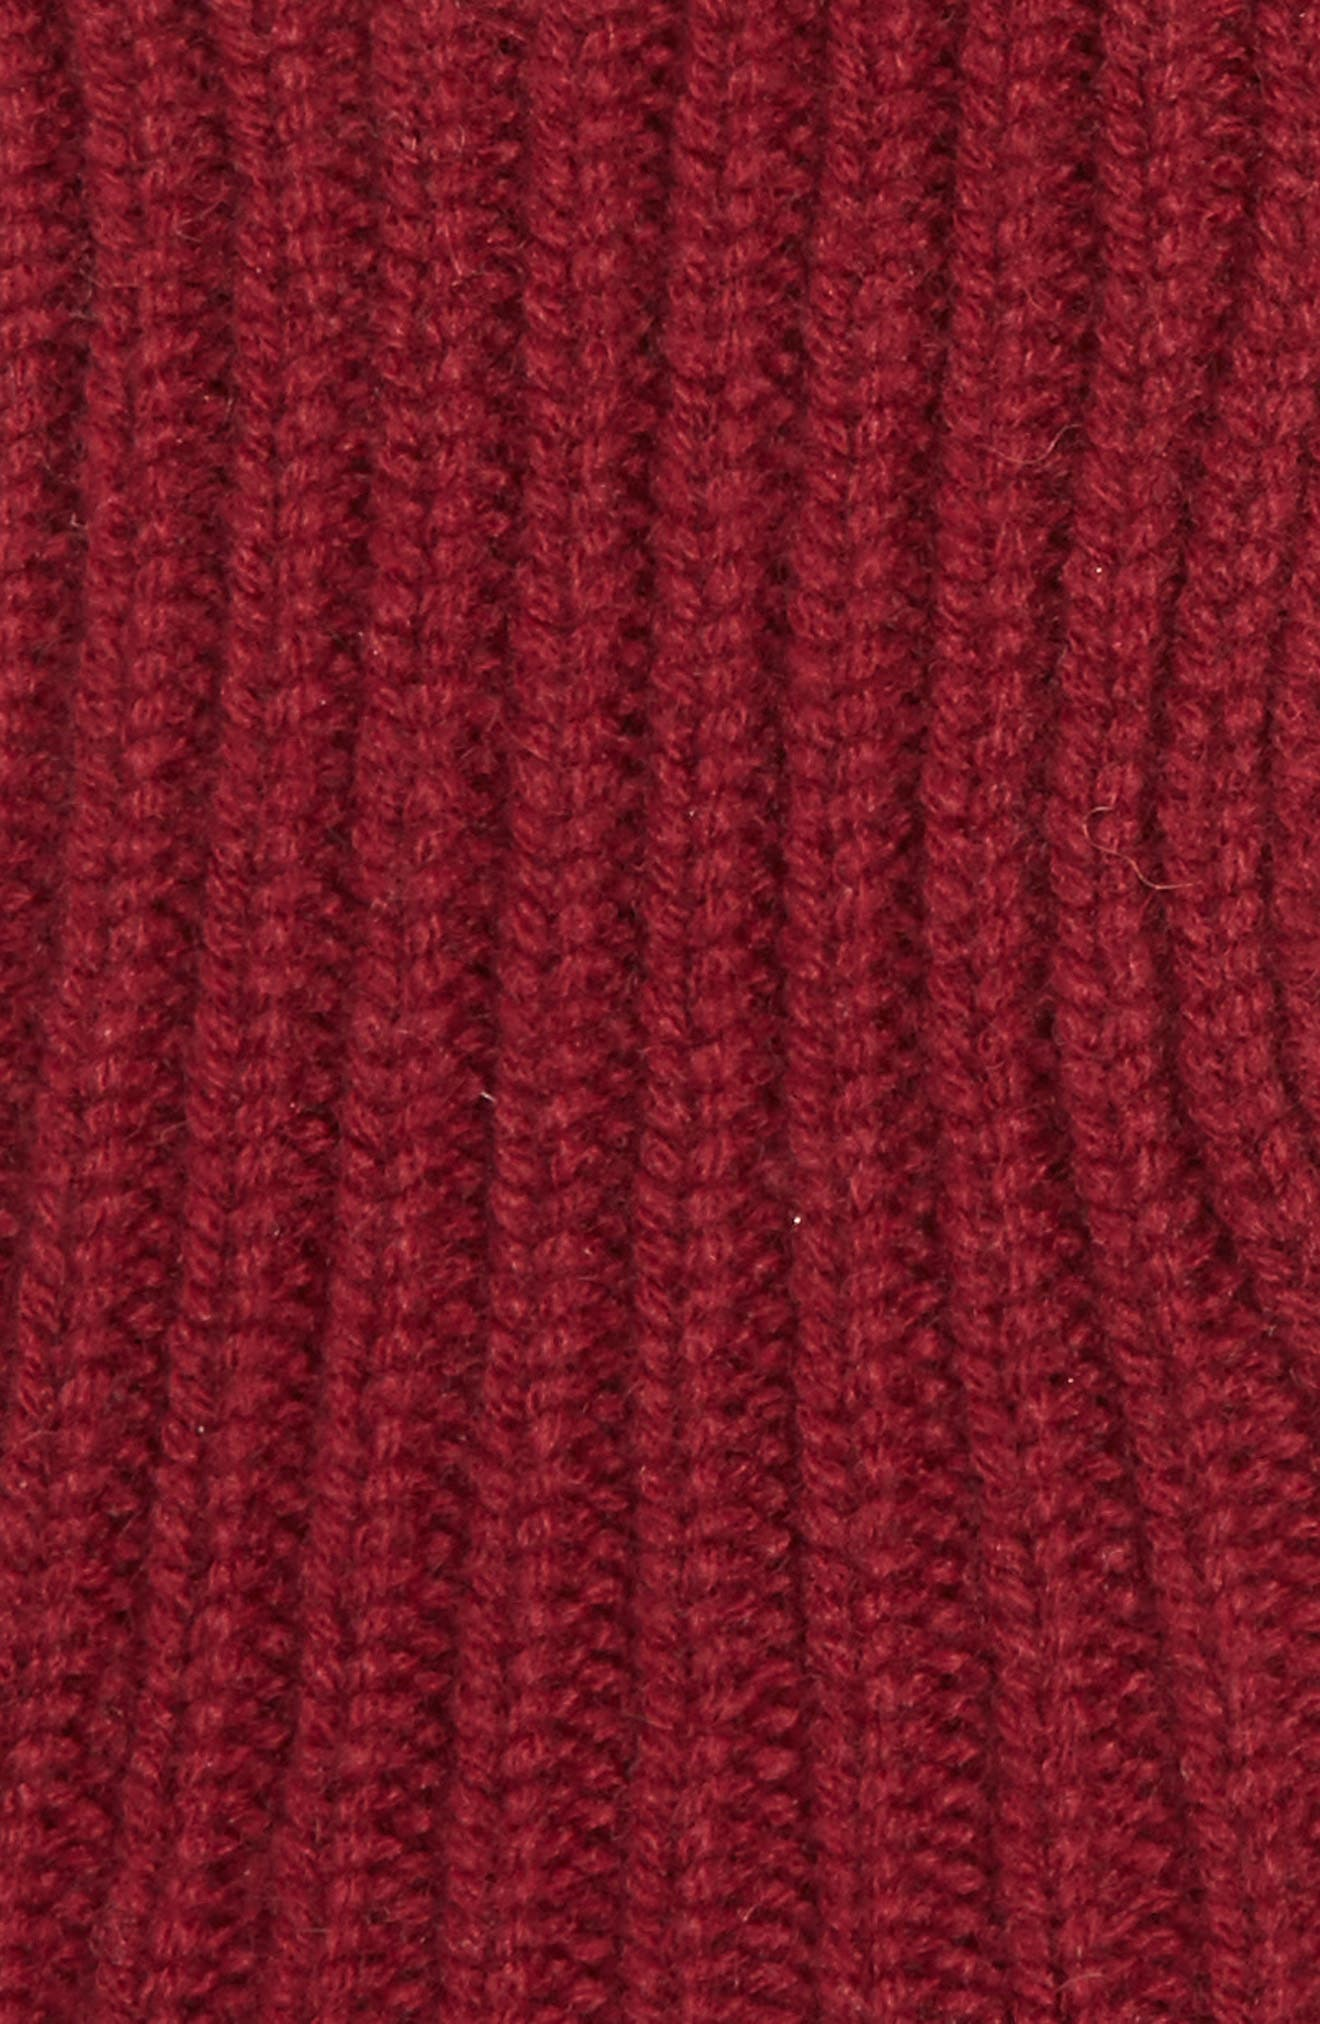 Guanti Wool & Cashmere Long Fingerless Gloves,                             Alternate thumbnail 3, color,                             BURGUNDY